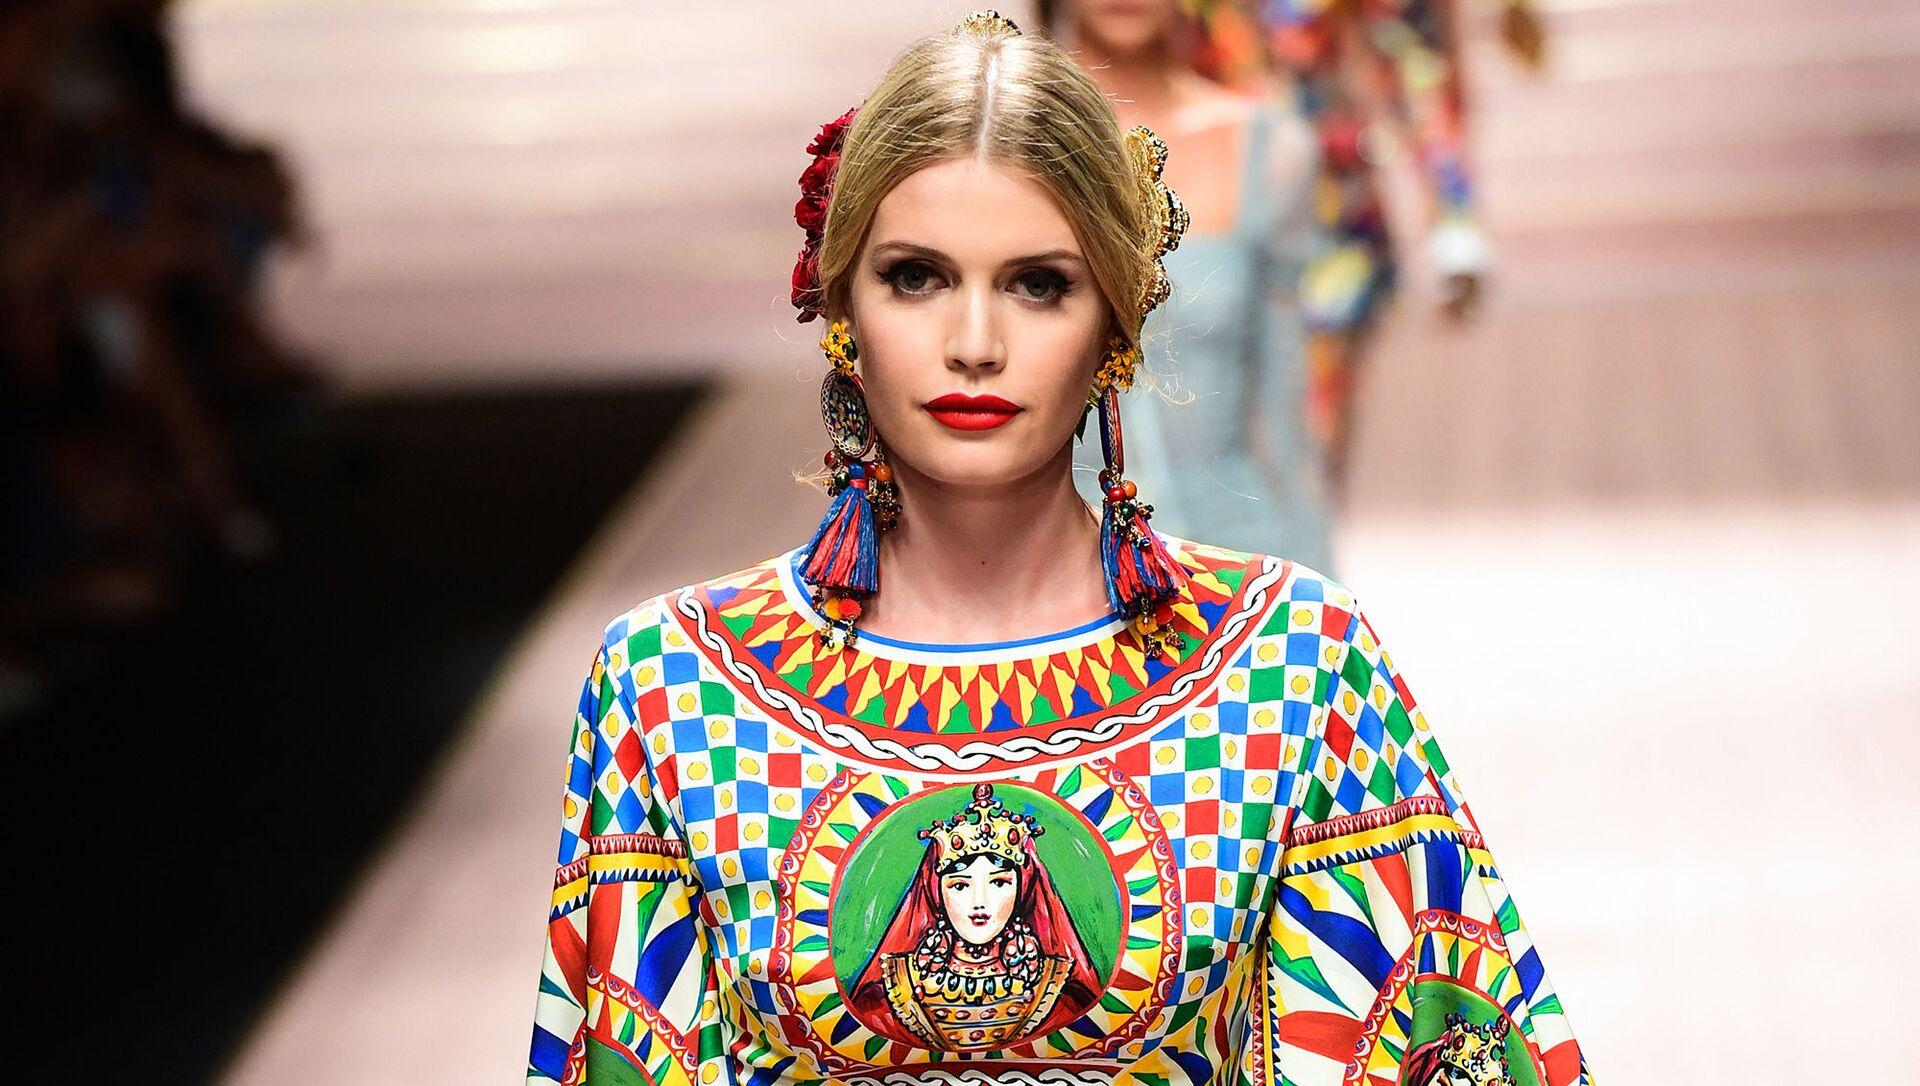 Племянница принцессы Дианы Китти Спенсер стала лицом Dolce & Gabbana  - Sputnik Азербайджан, 1920, 01.03.2021